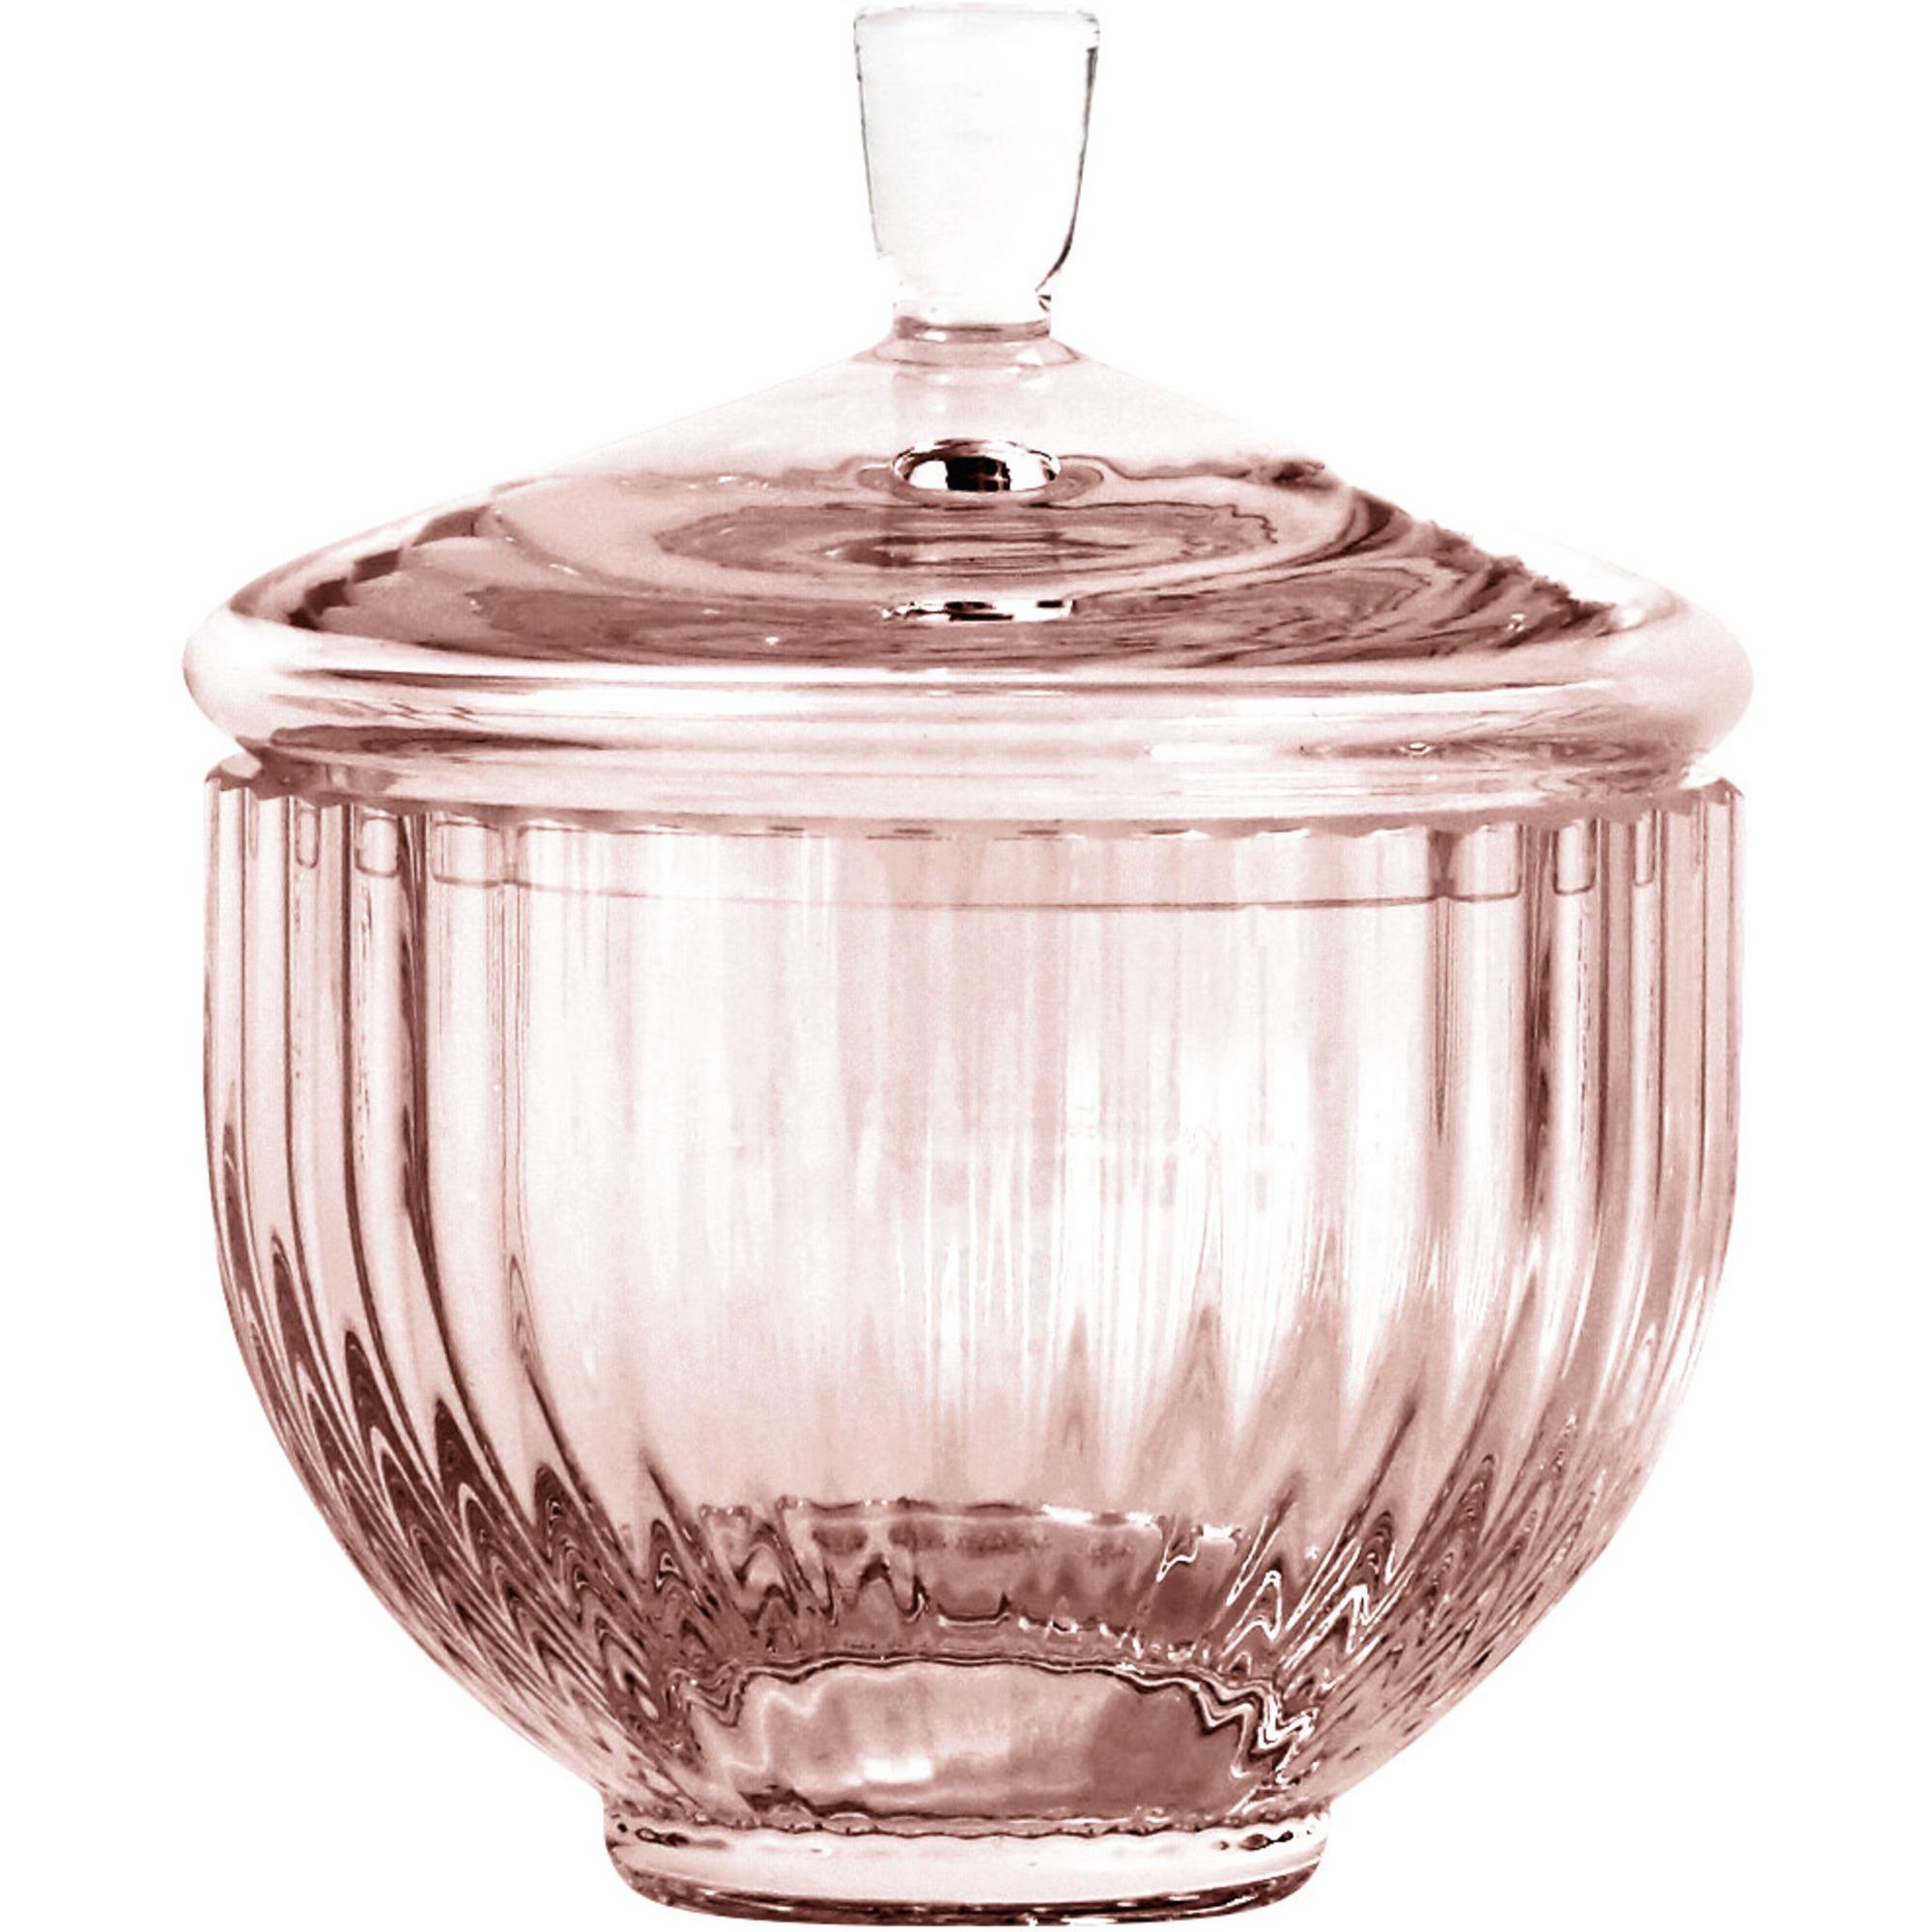 Lyngby Porcelæn Glas bonbonniere Ø 10 cm. burgundy